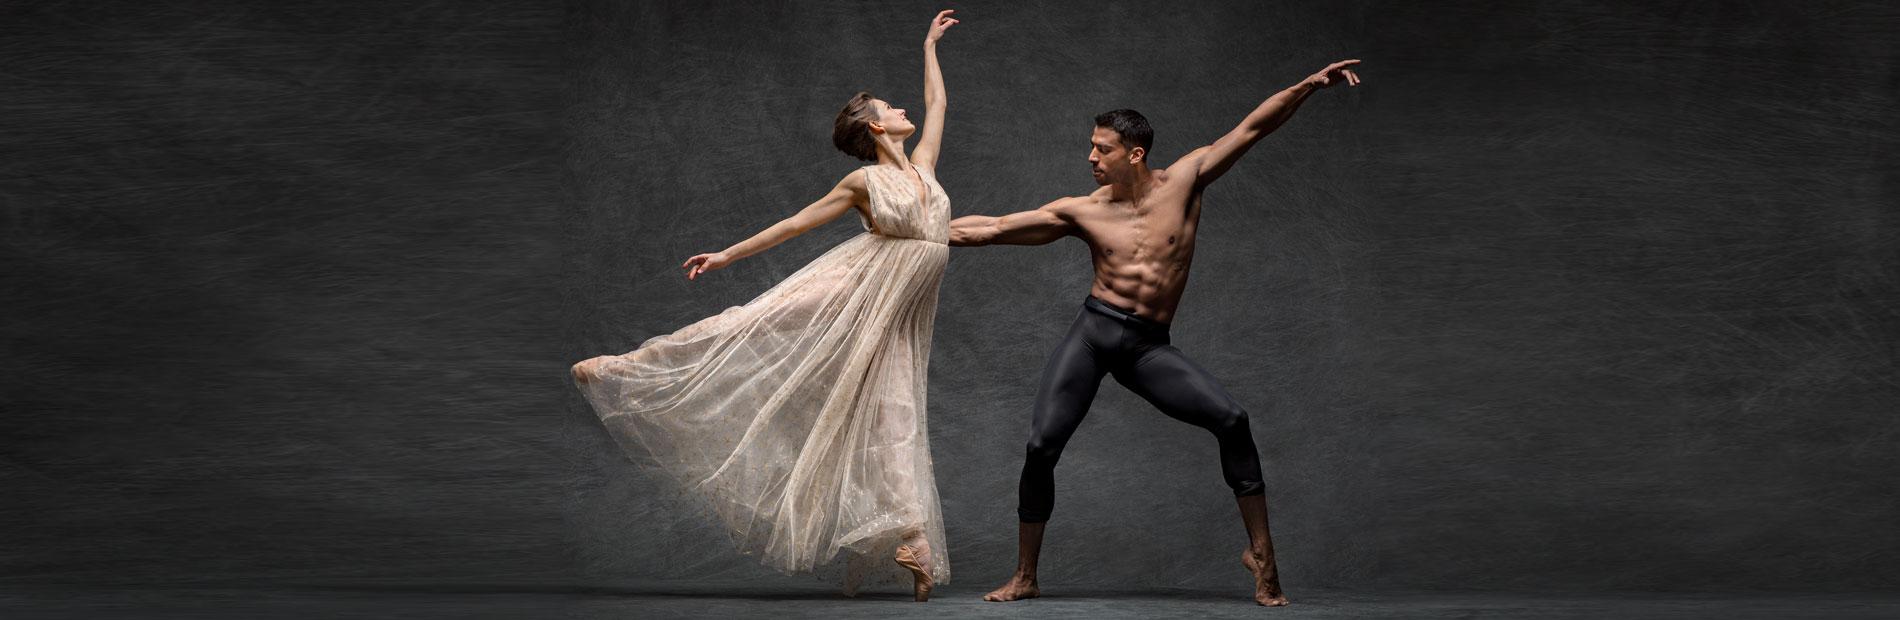 hight resolution of the aspen sante fe ballet dancers